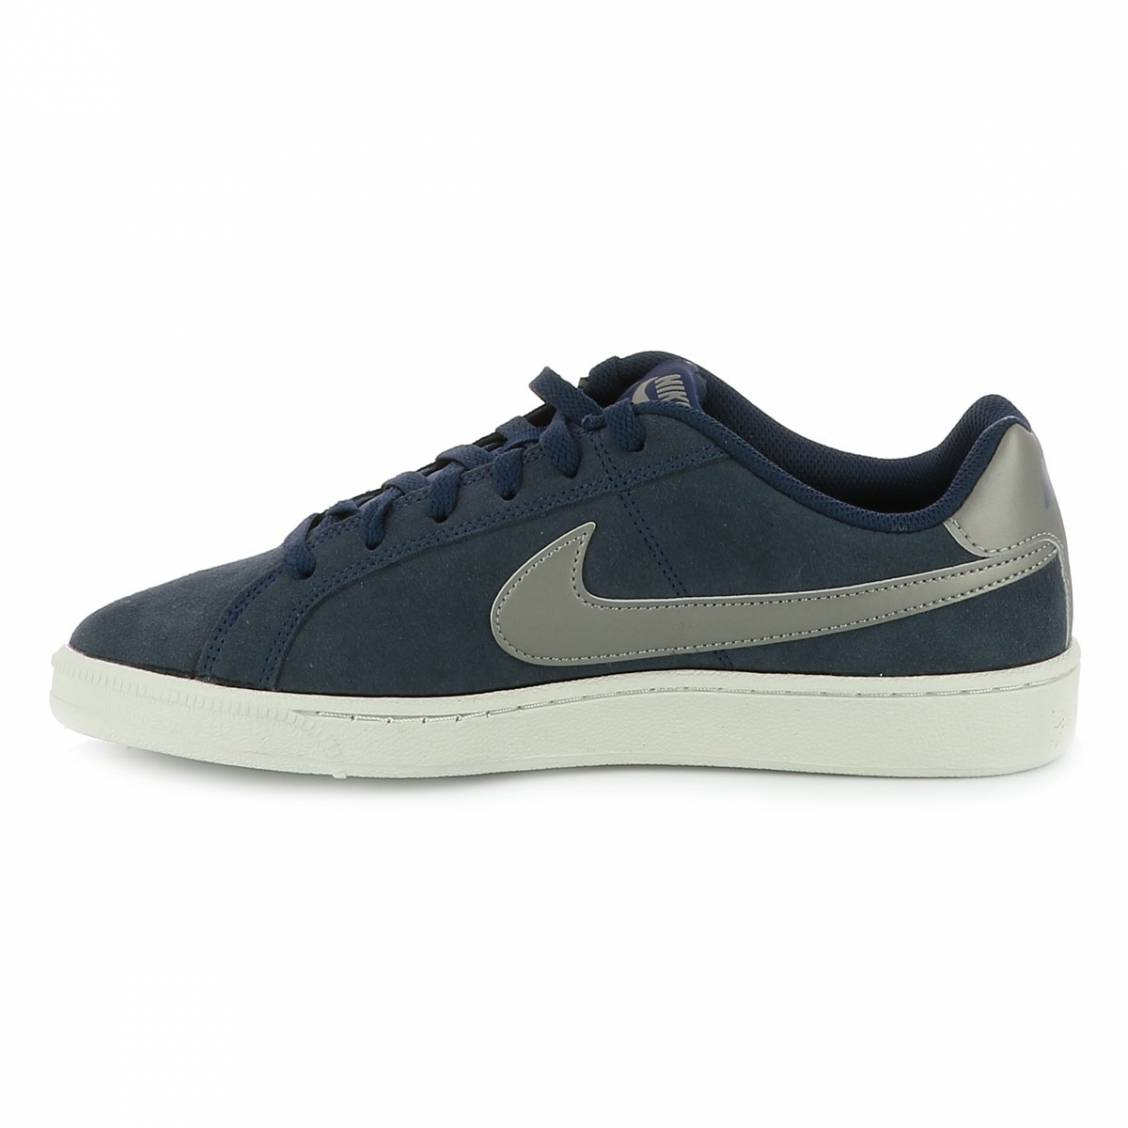 online store 3eeea 502a6 ... Baskets Nike Court Royale bleu marine ...